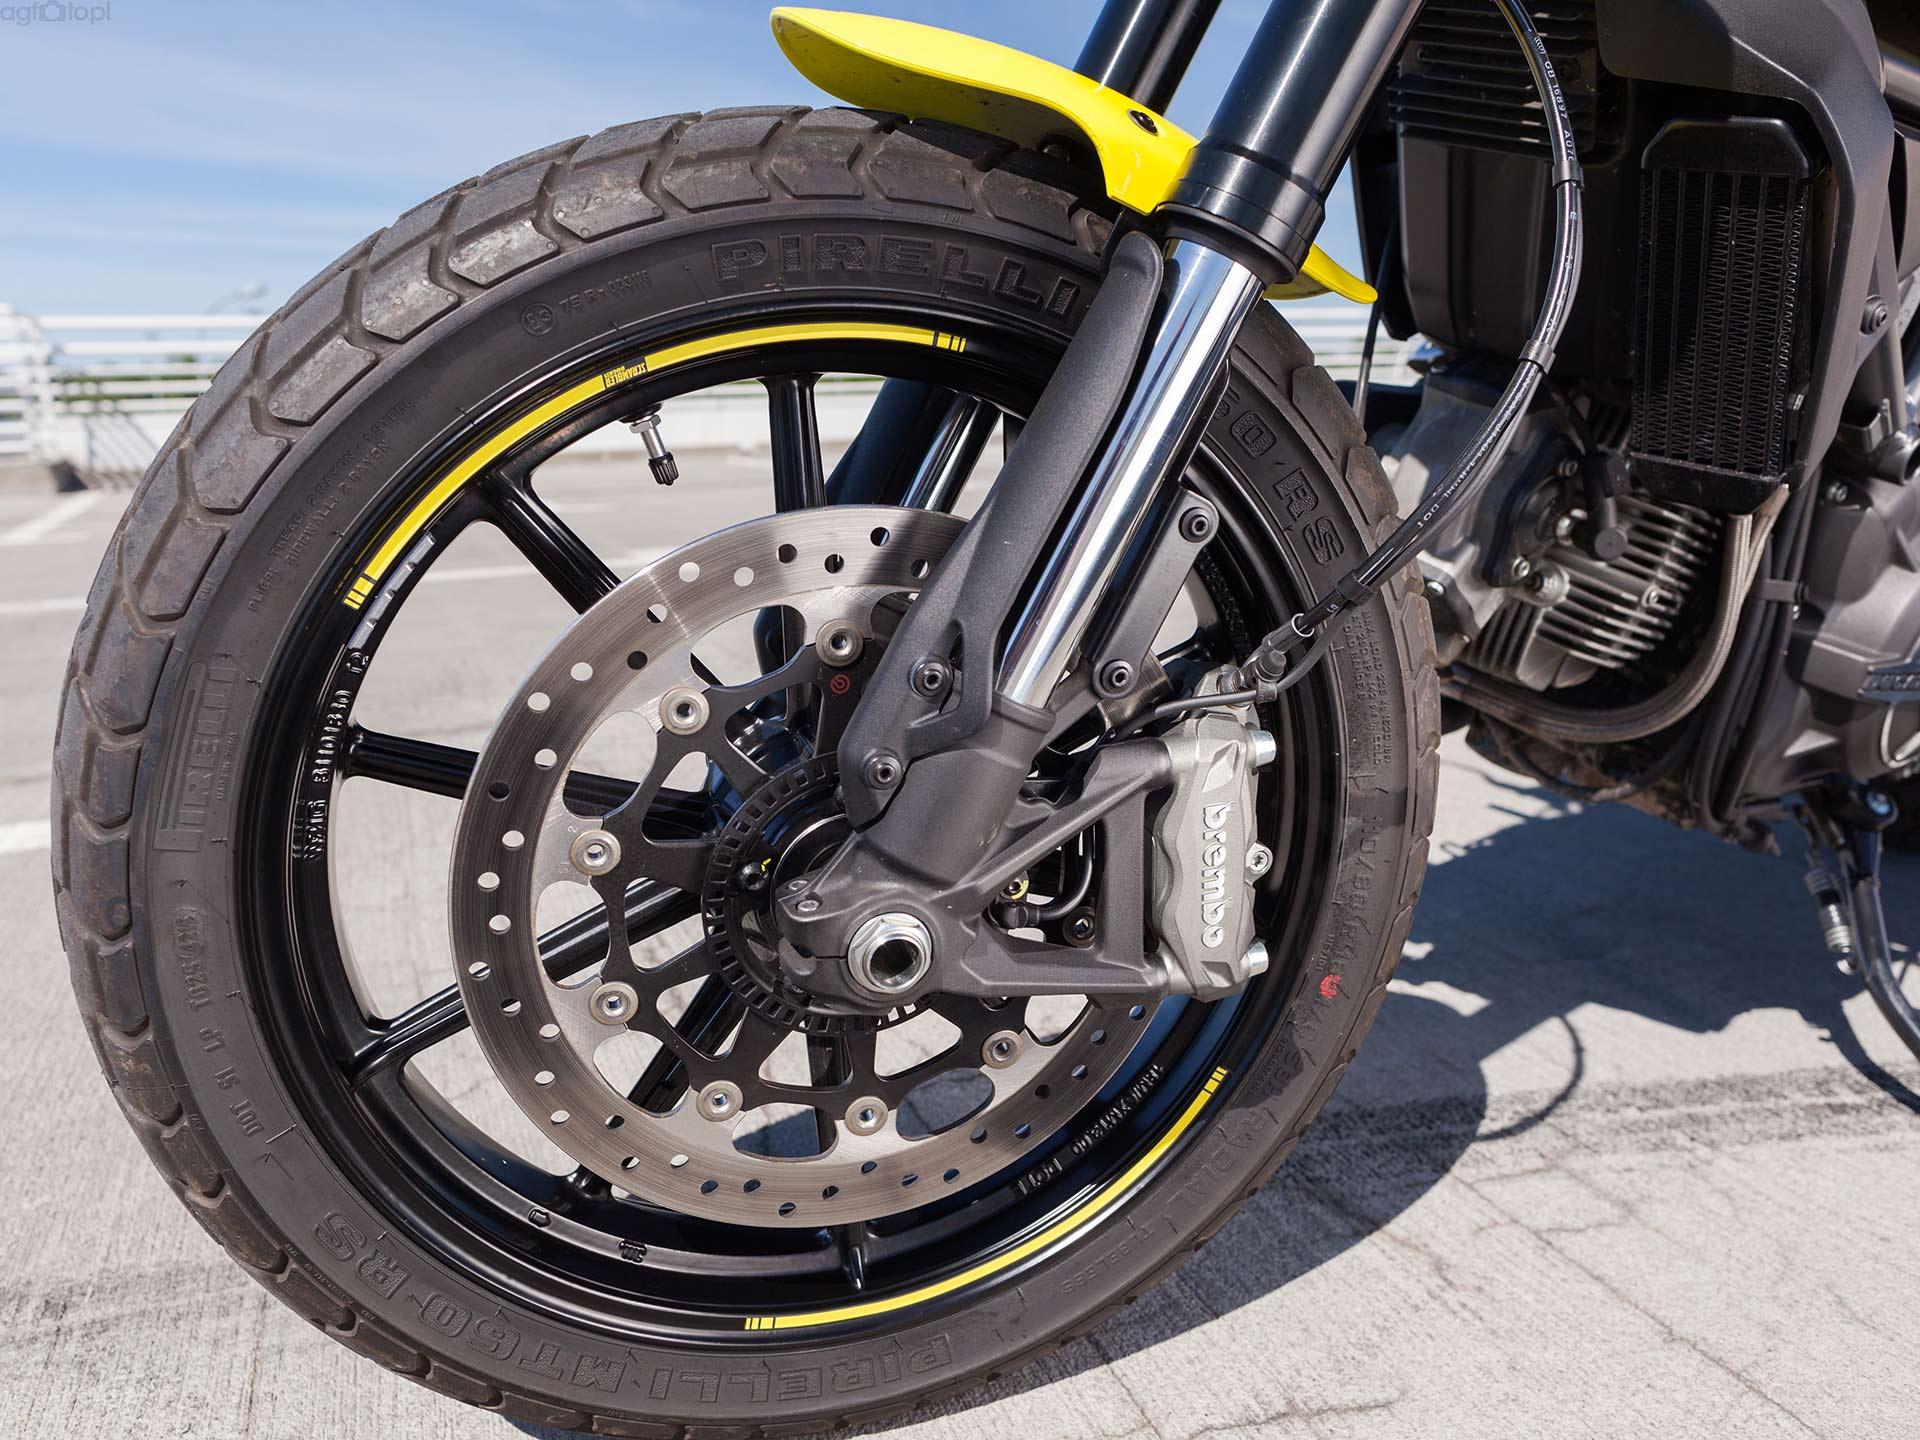 ducati_scrambler_hamulce_motocyklicznie